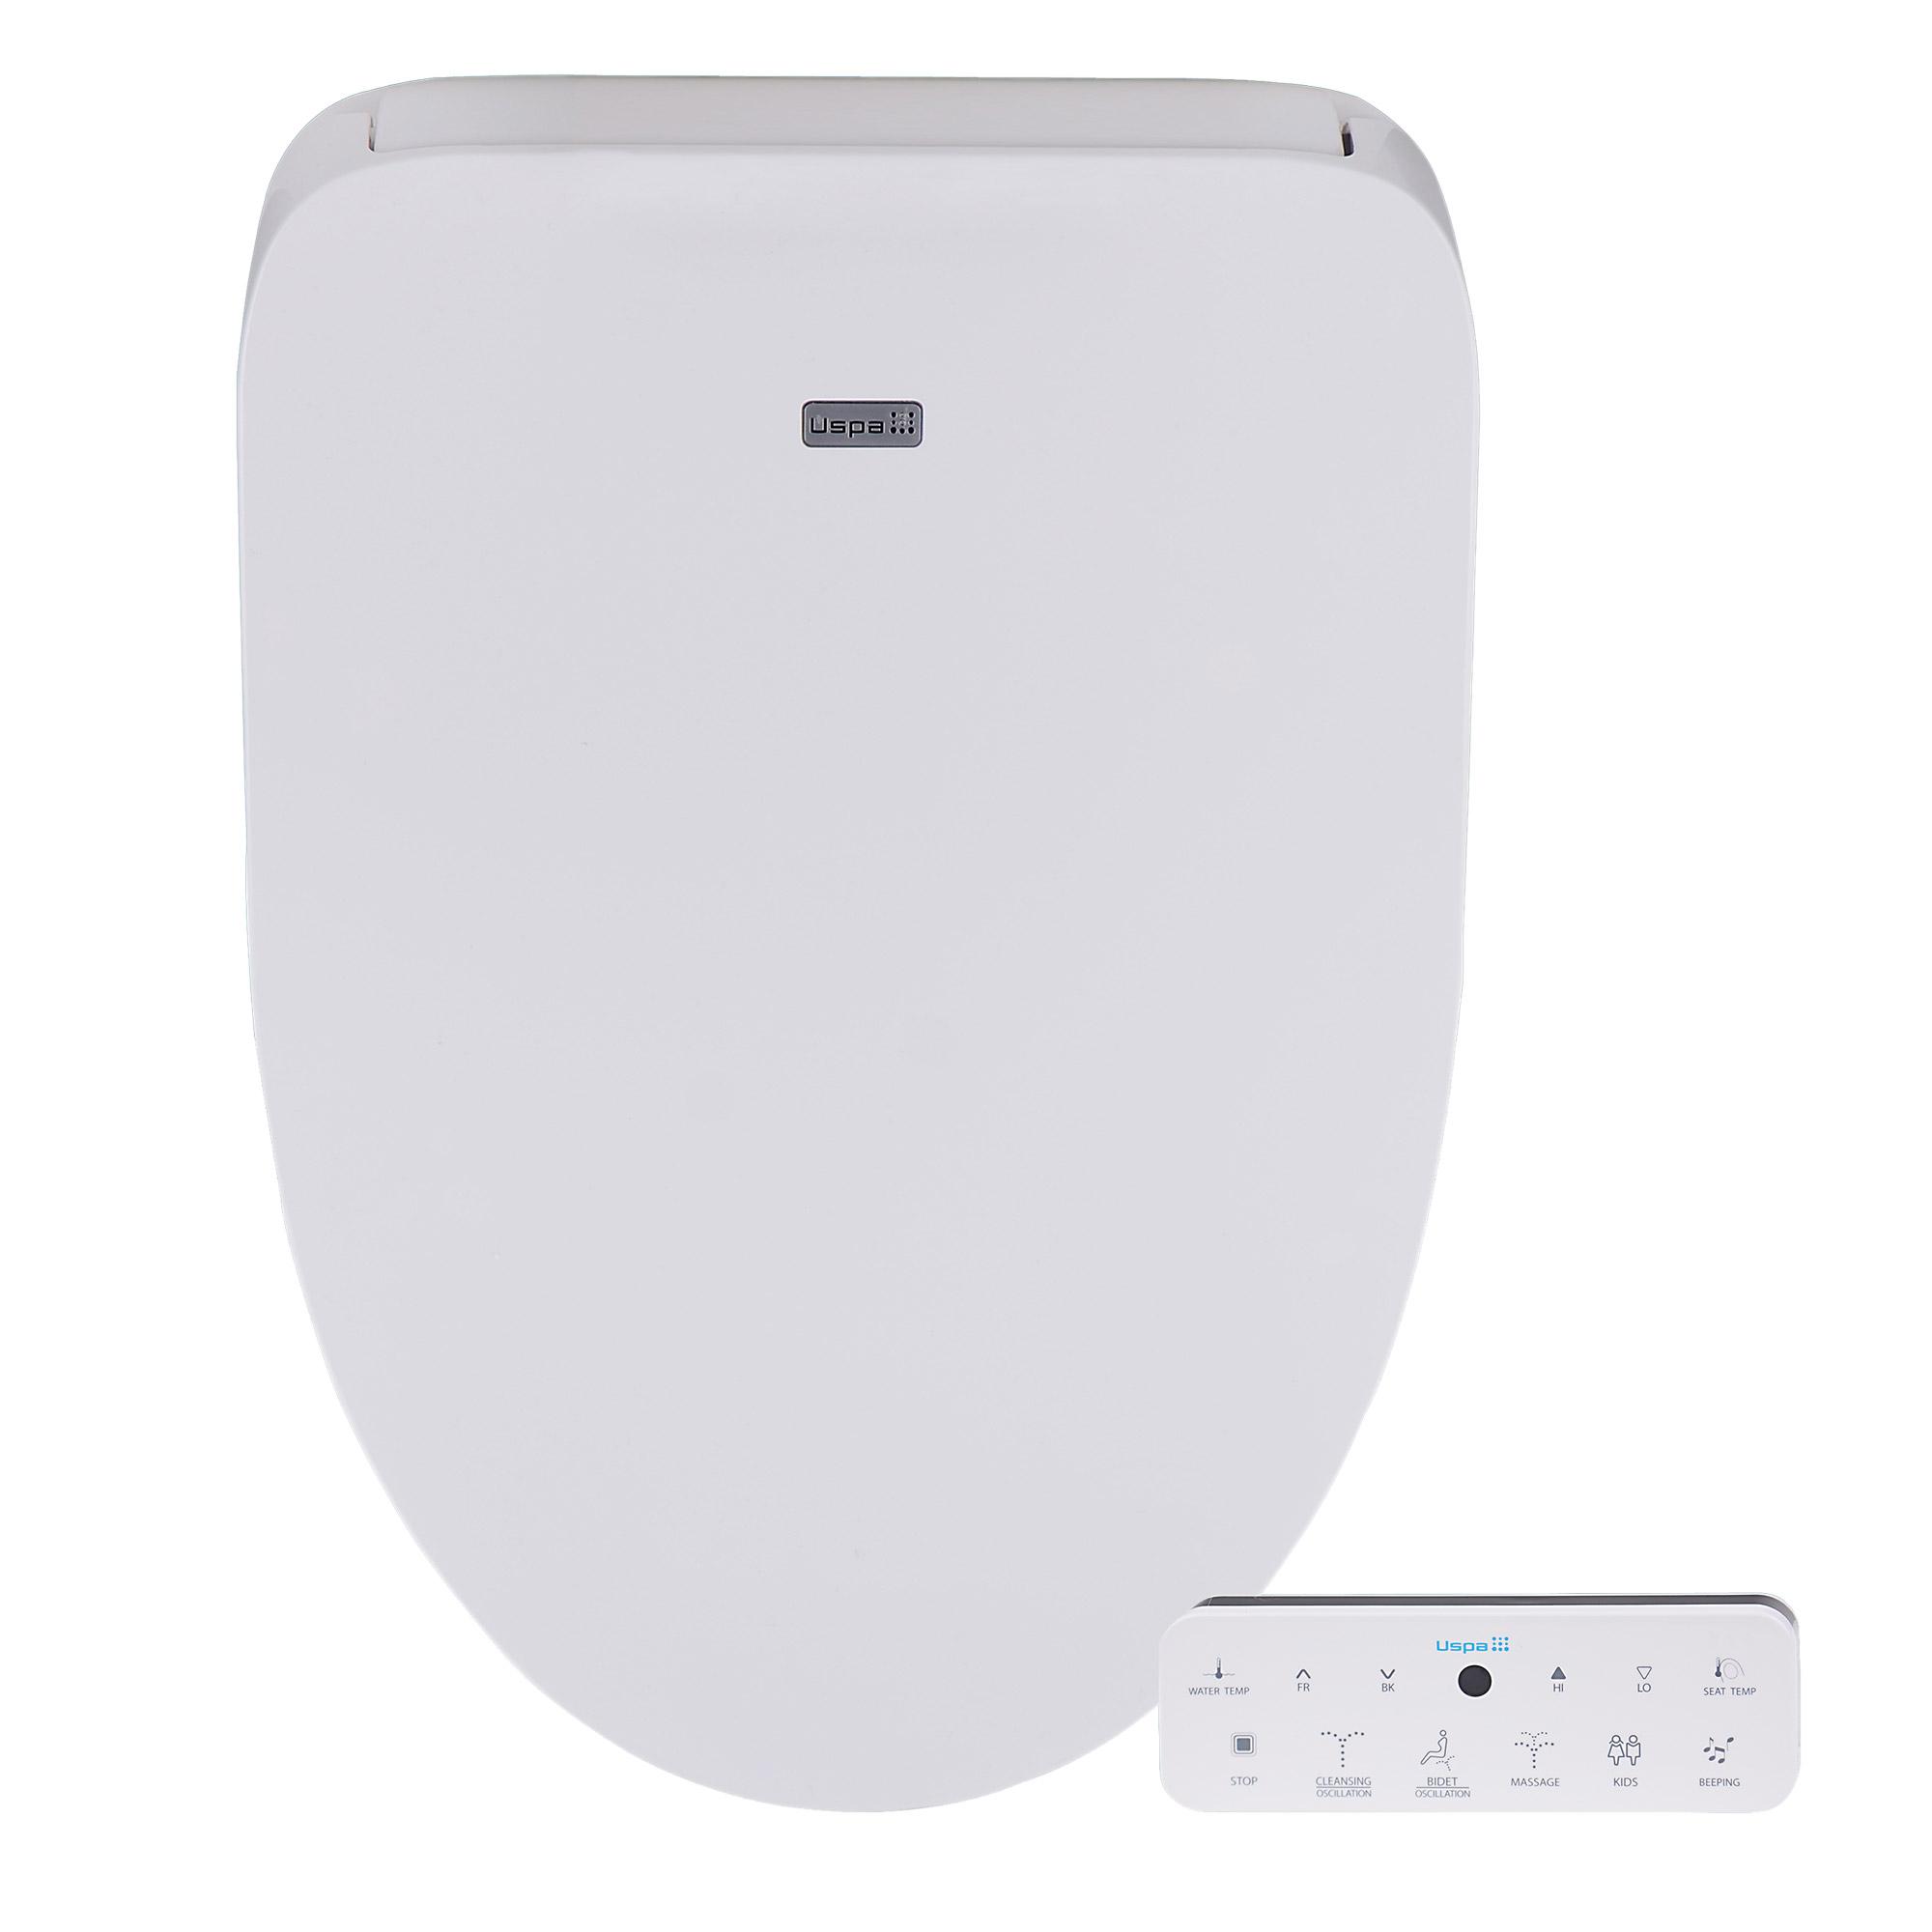 Bio bidet uspa 4800 luxury smart bidet toilet seat in white new ebay - Bidet heated toilet seat ...